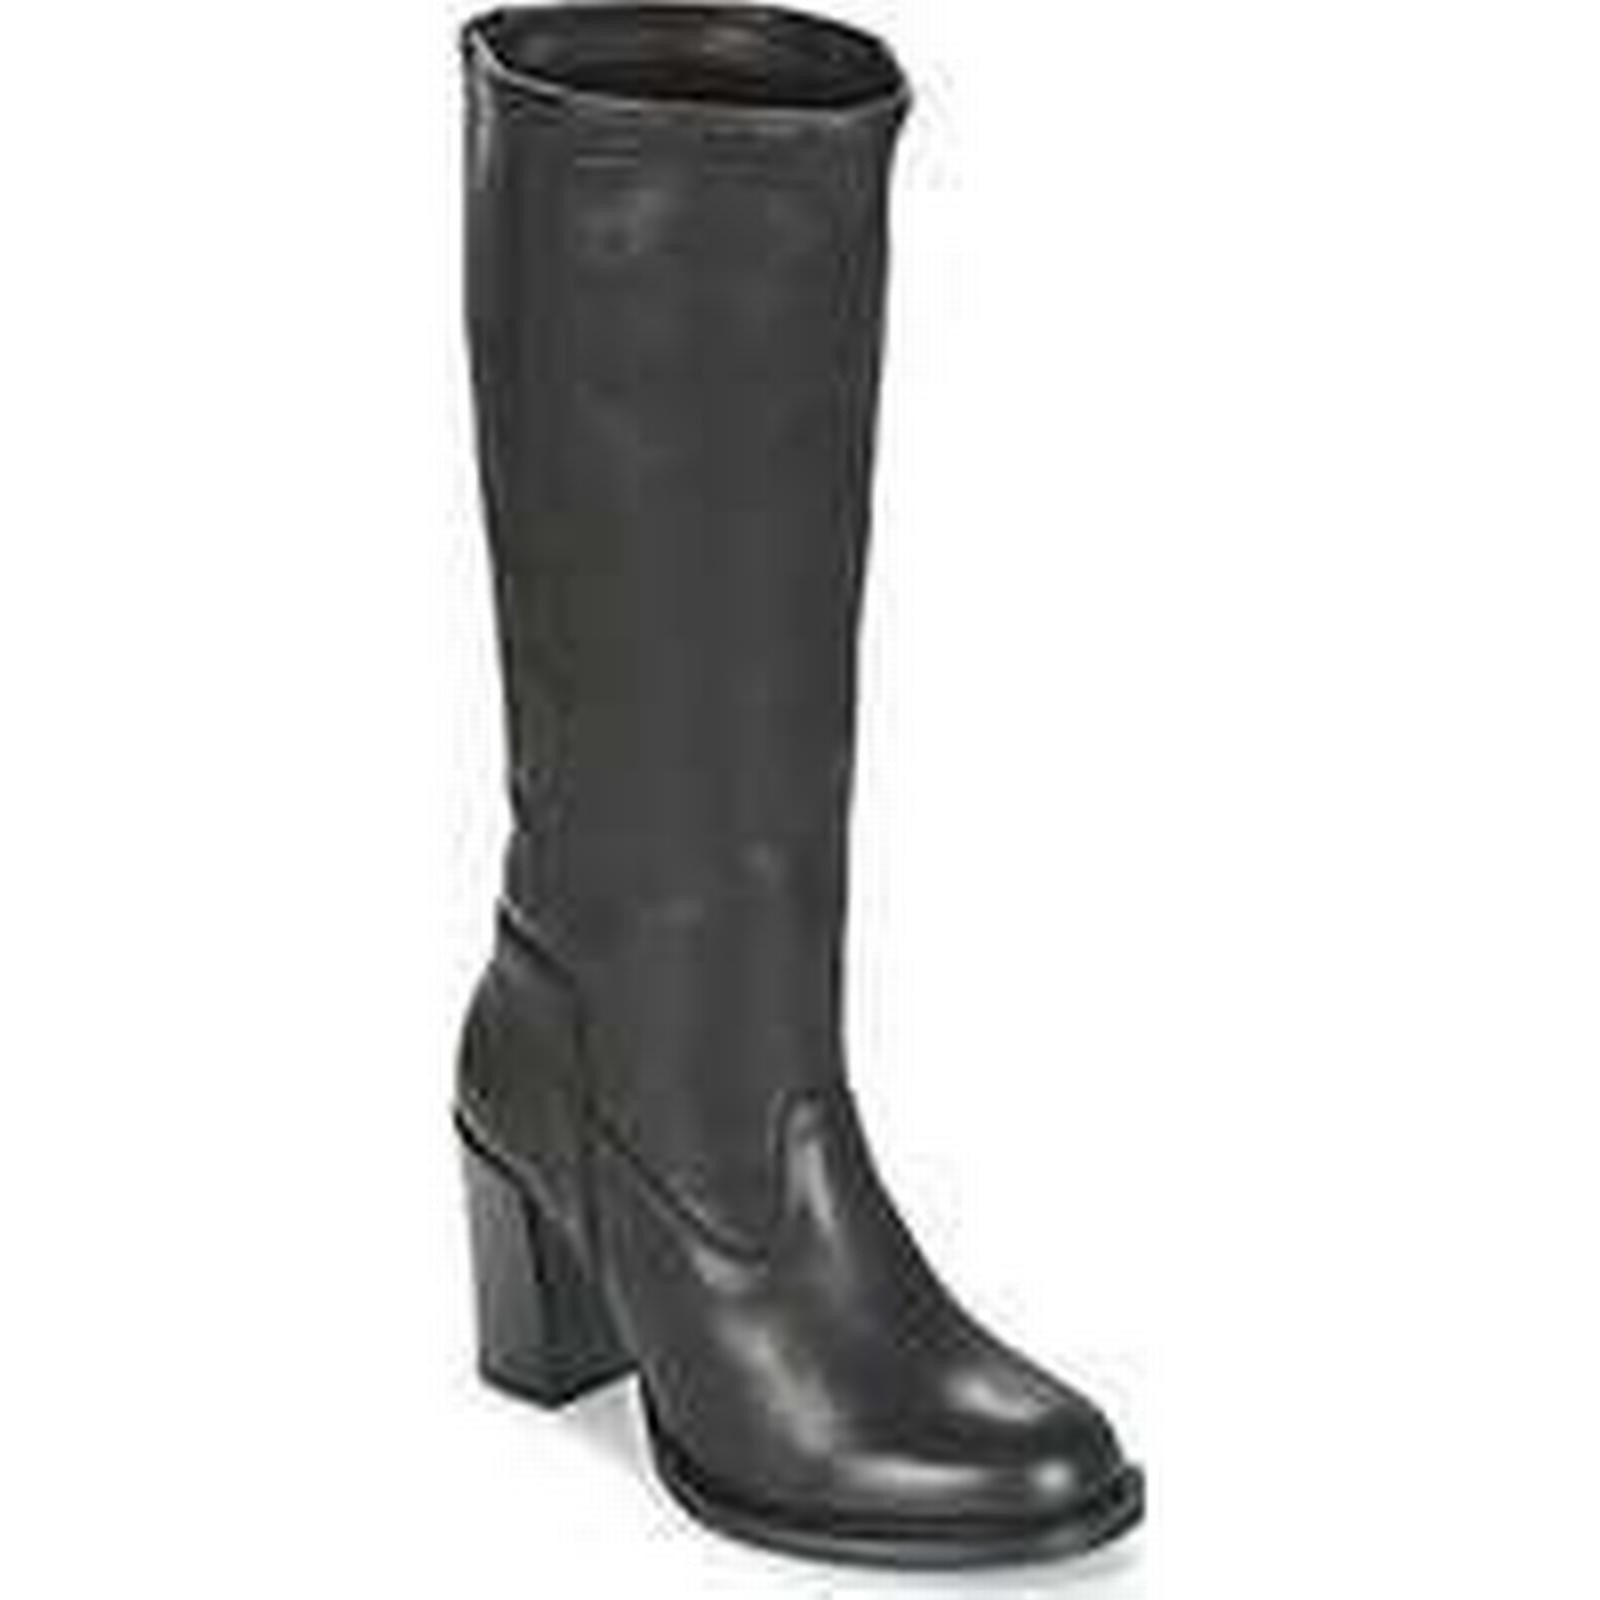 Spartoo.co.uk PLDM by Boots Palladium HARTVILLE IBX women's High Boots by in Black b82d92